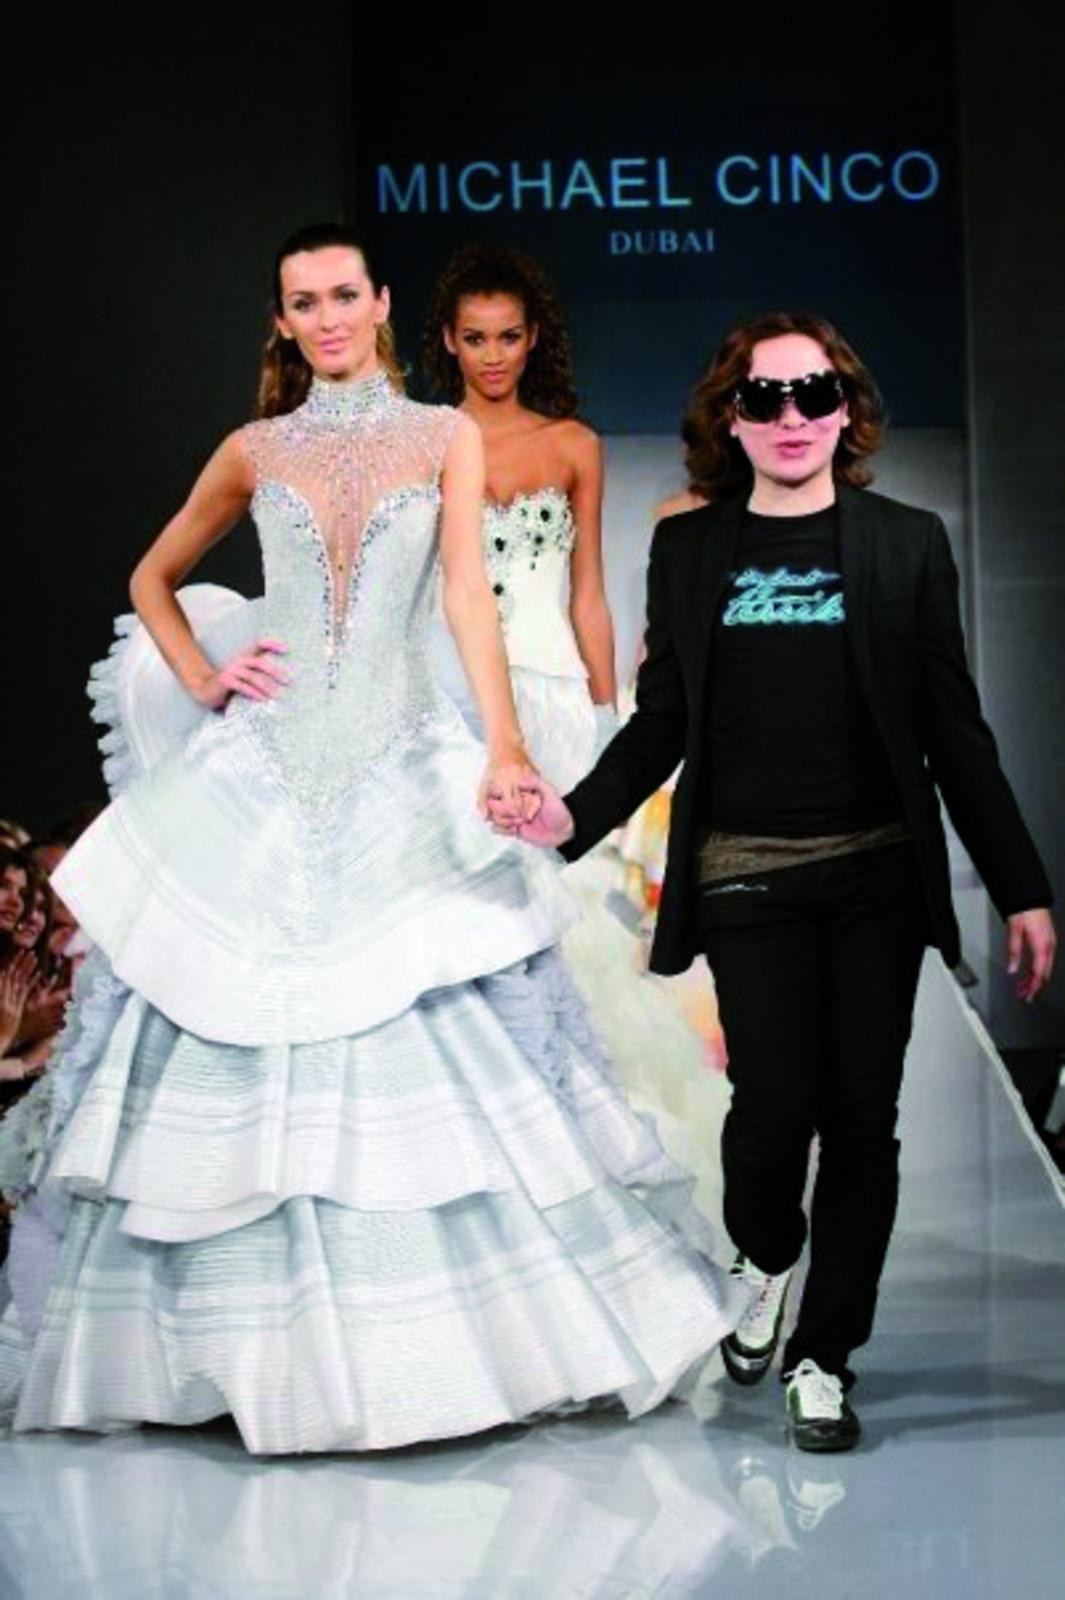 Michael Cinco Fashion Show: The Socialite Observer